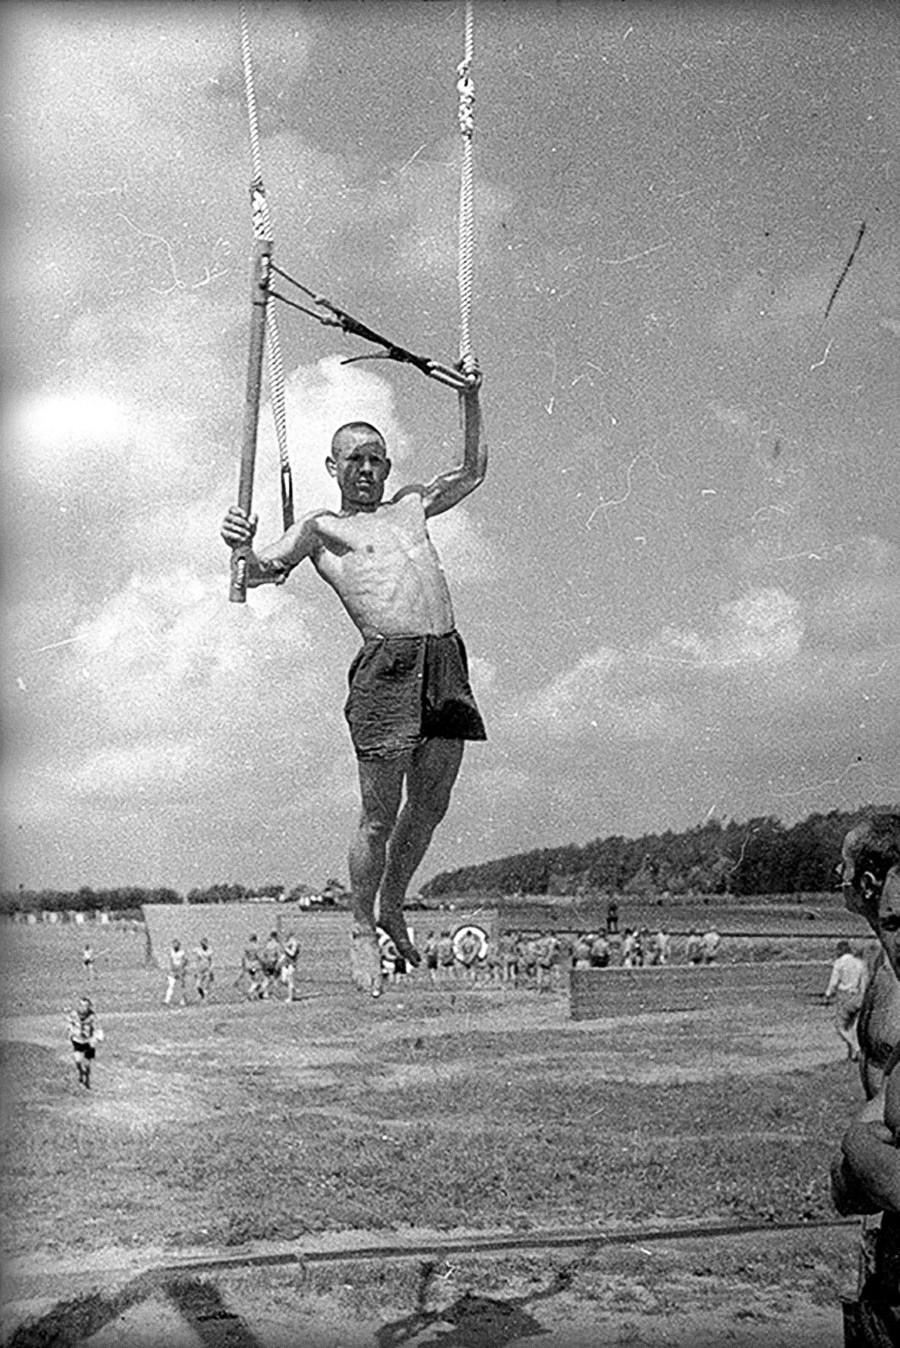 Athlete, 1934